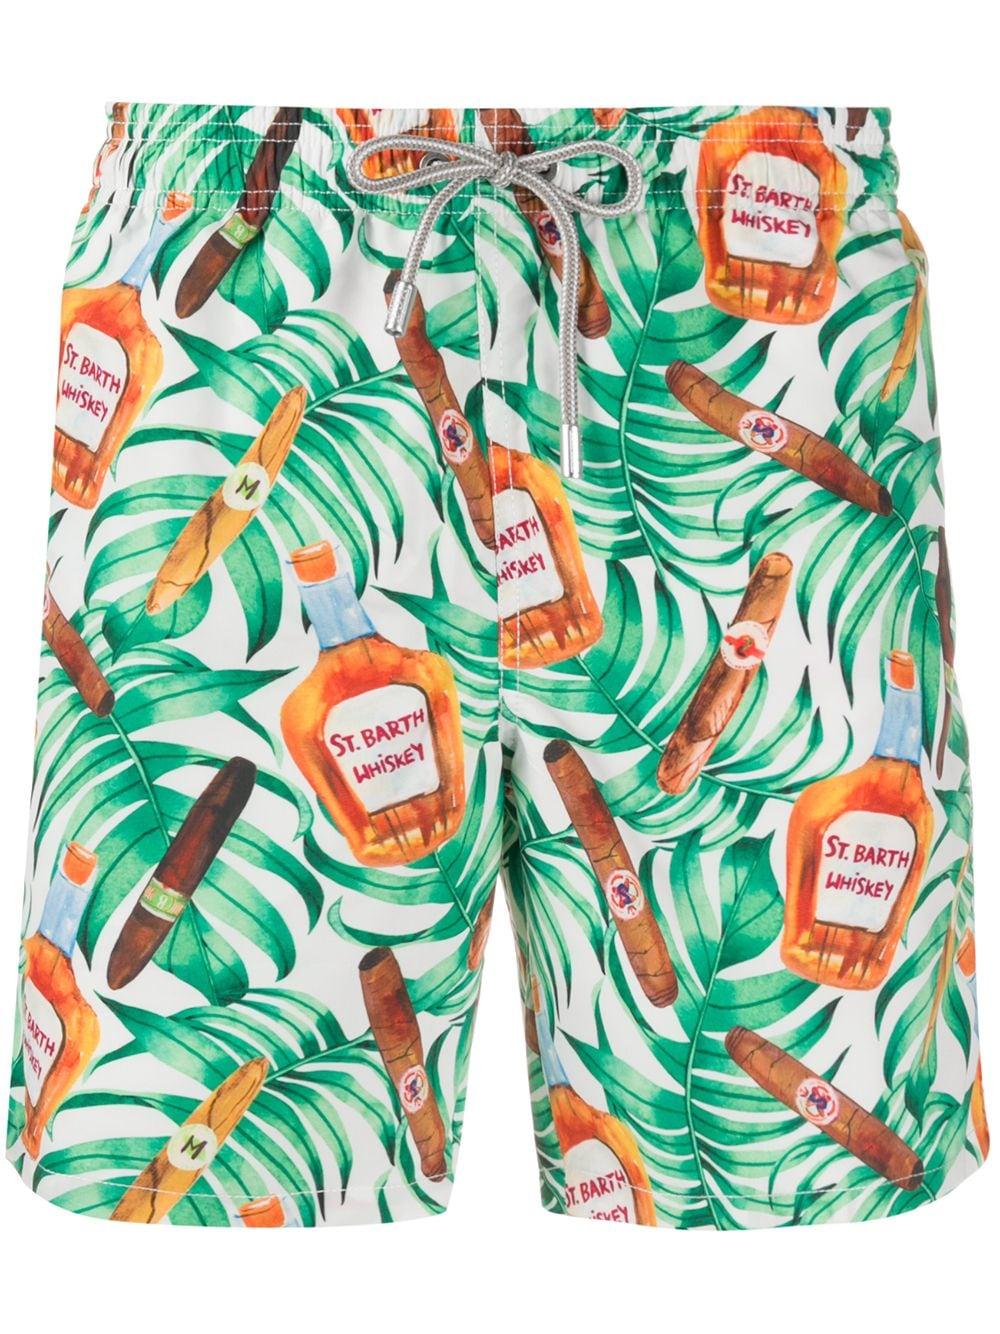 Green leaves and whiskey Gustavia Buena Vista print swim shorts  MC2 |  | GUSTAVIA-BUONA VISTA01